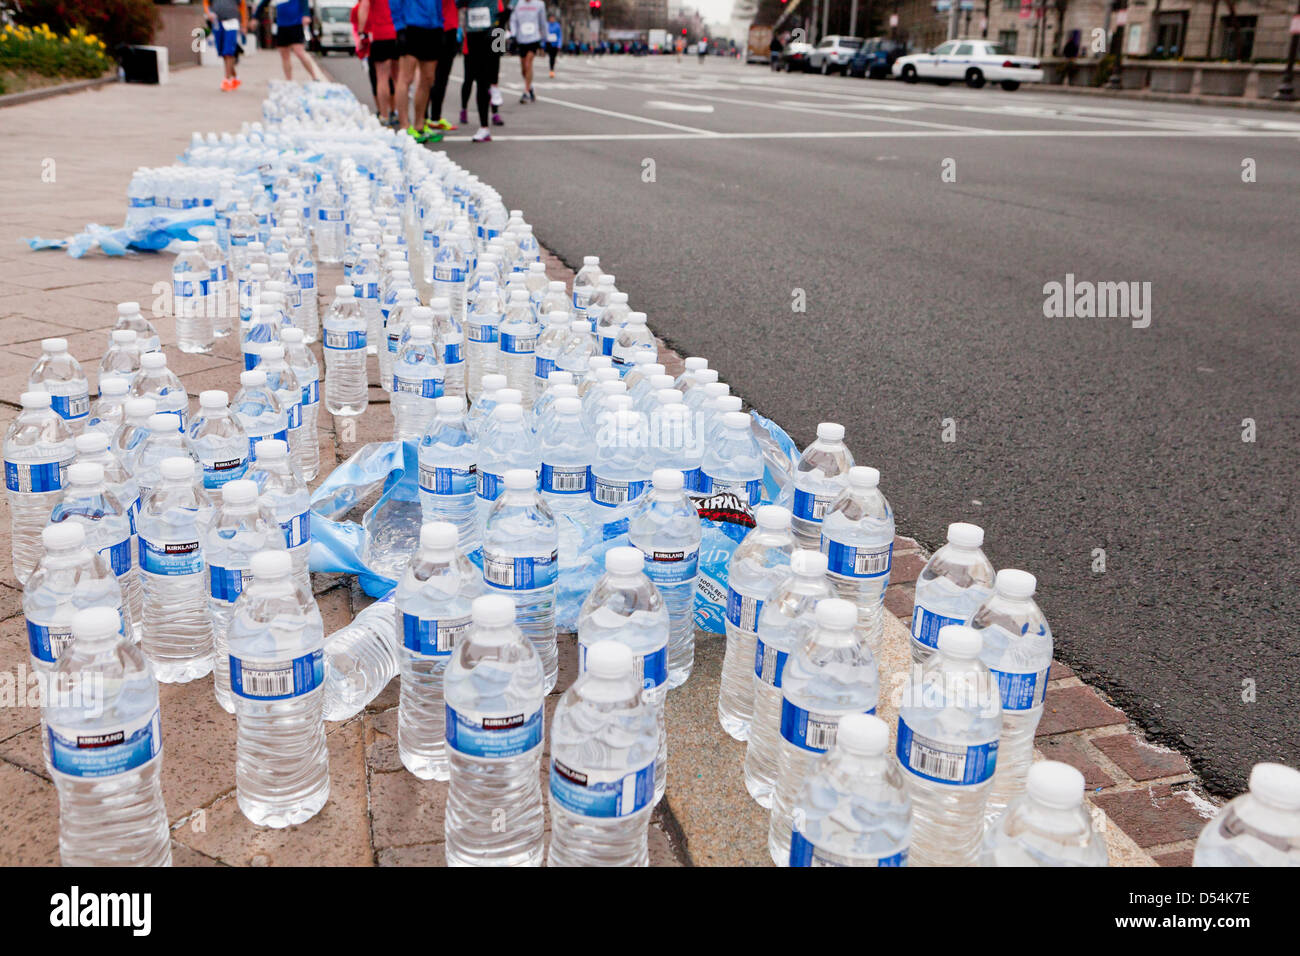 Acqua in bottiglia schierate per guide di gara Immagini Stock